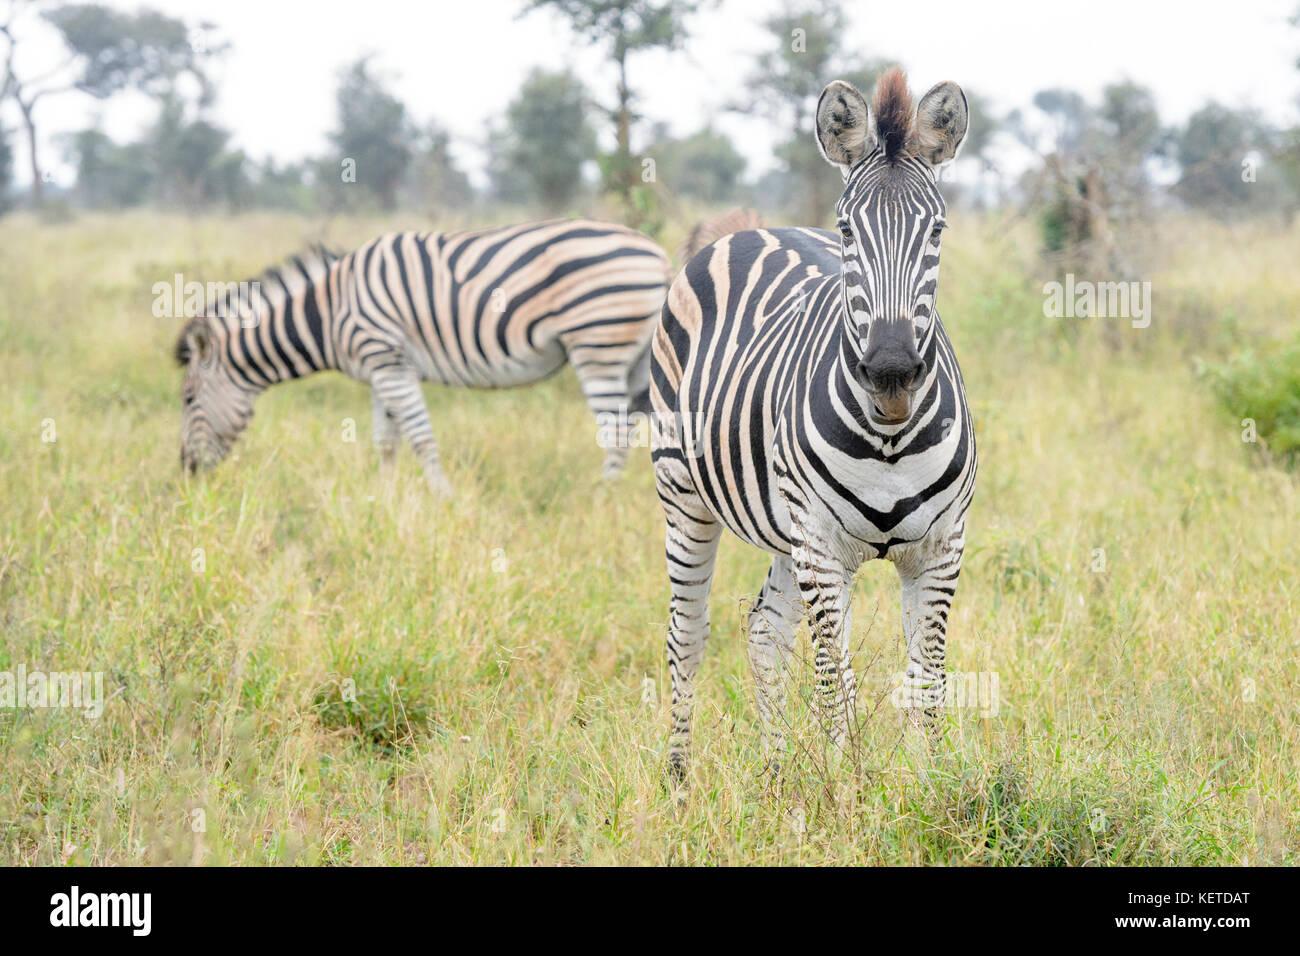 Burchell zebra o planicies cebra (Equus quagga), mirando a la cámara, el parque nacional Kruger, Sudáfrica Imagen De Stock